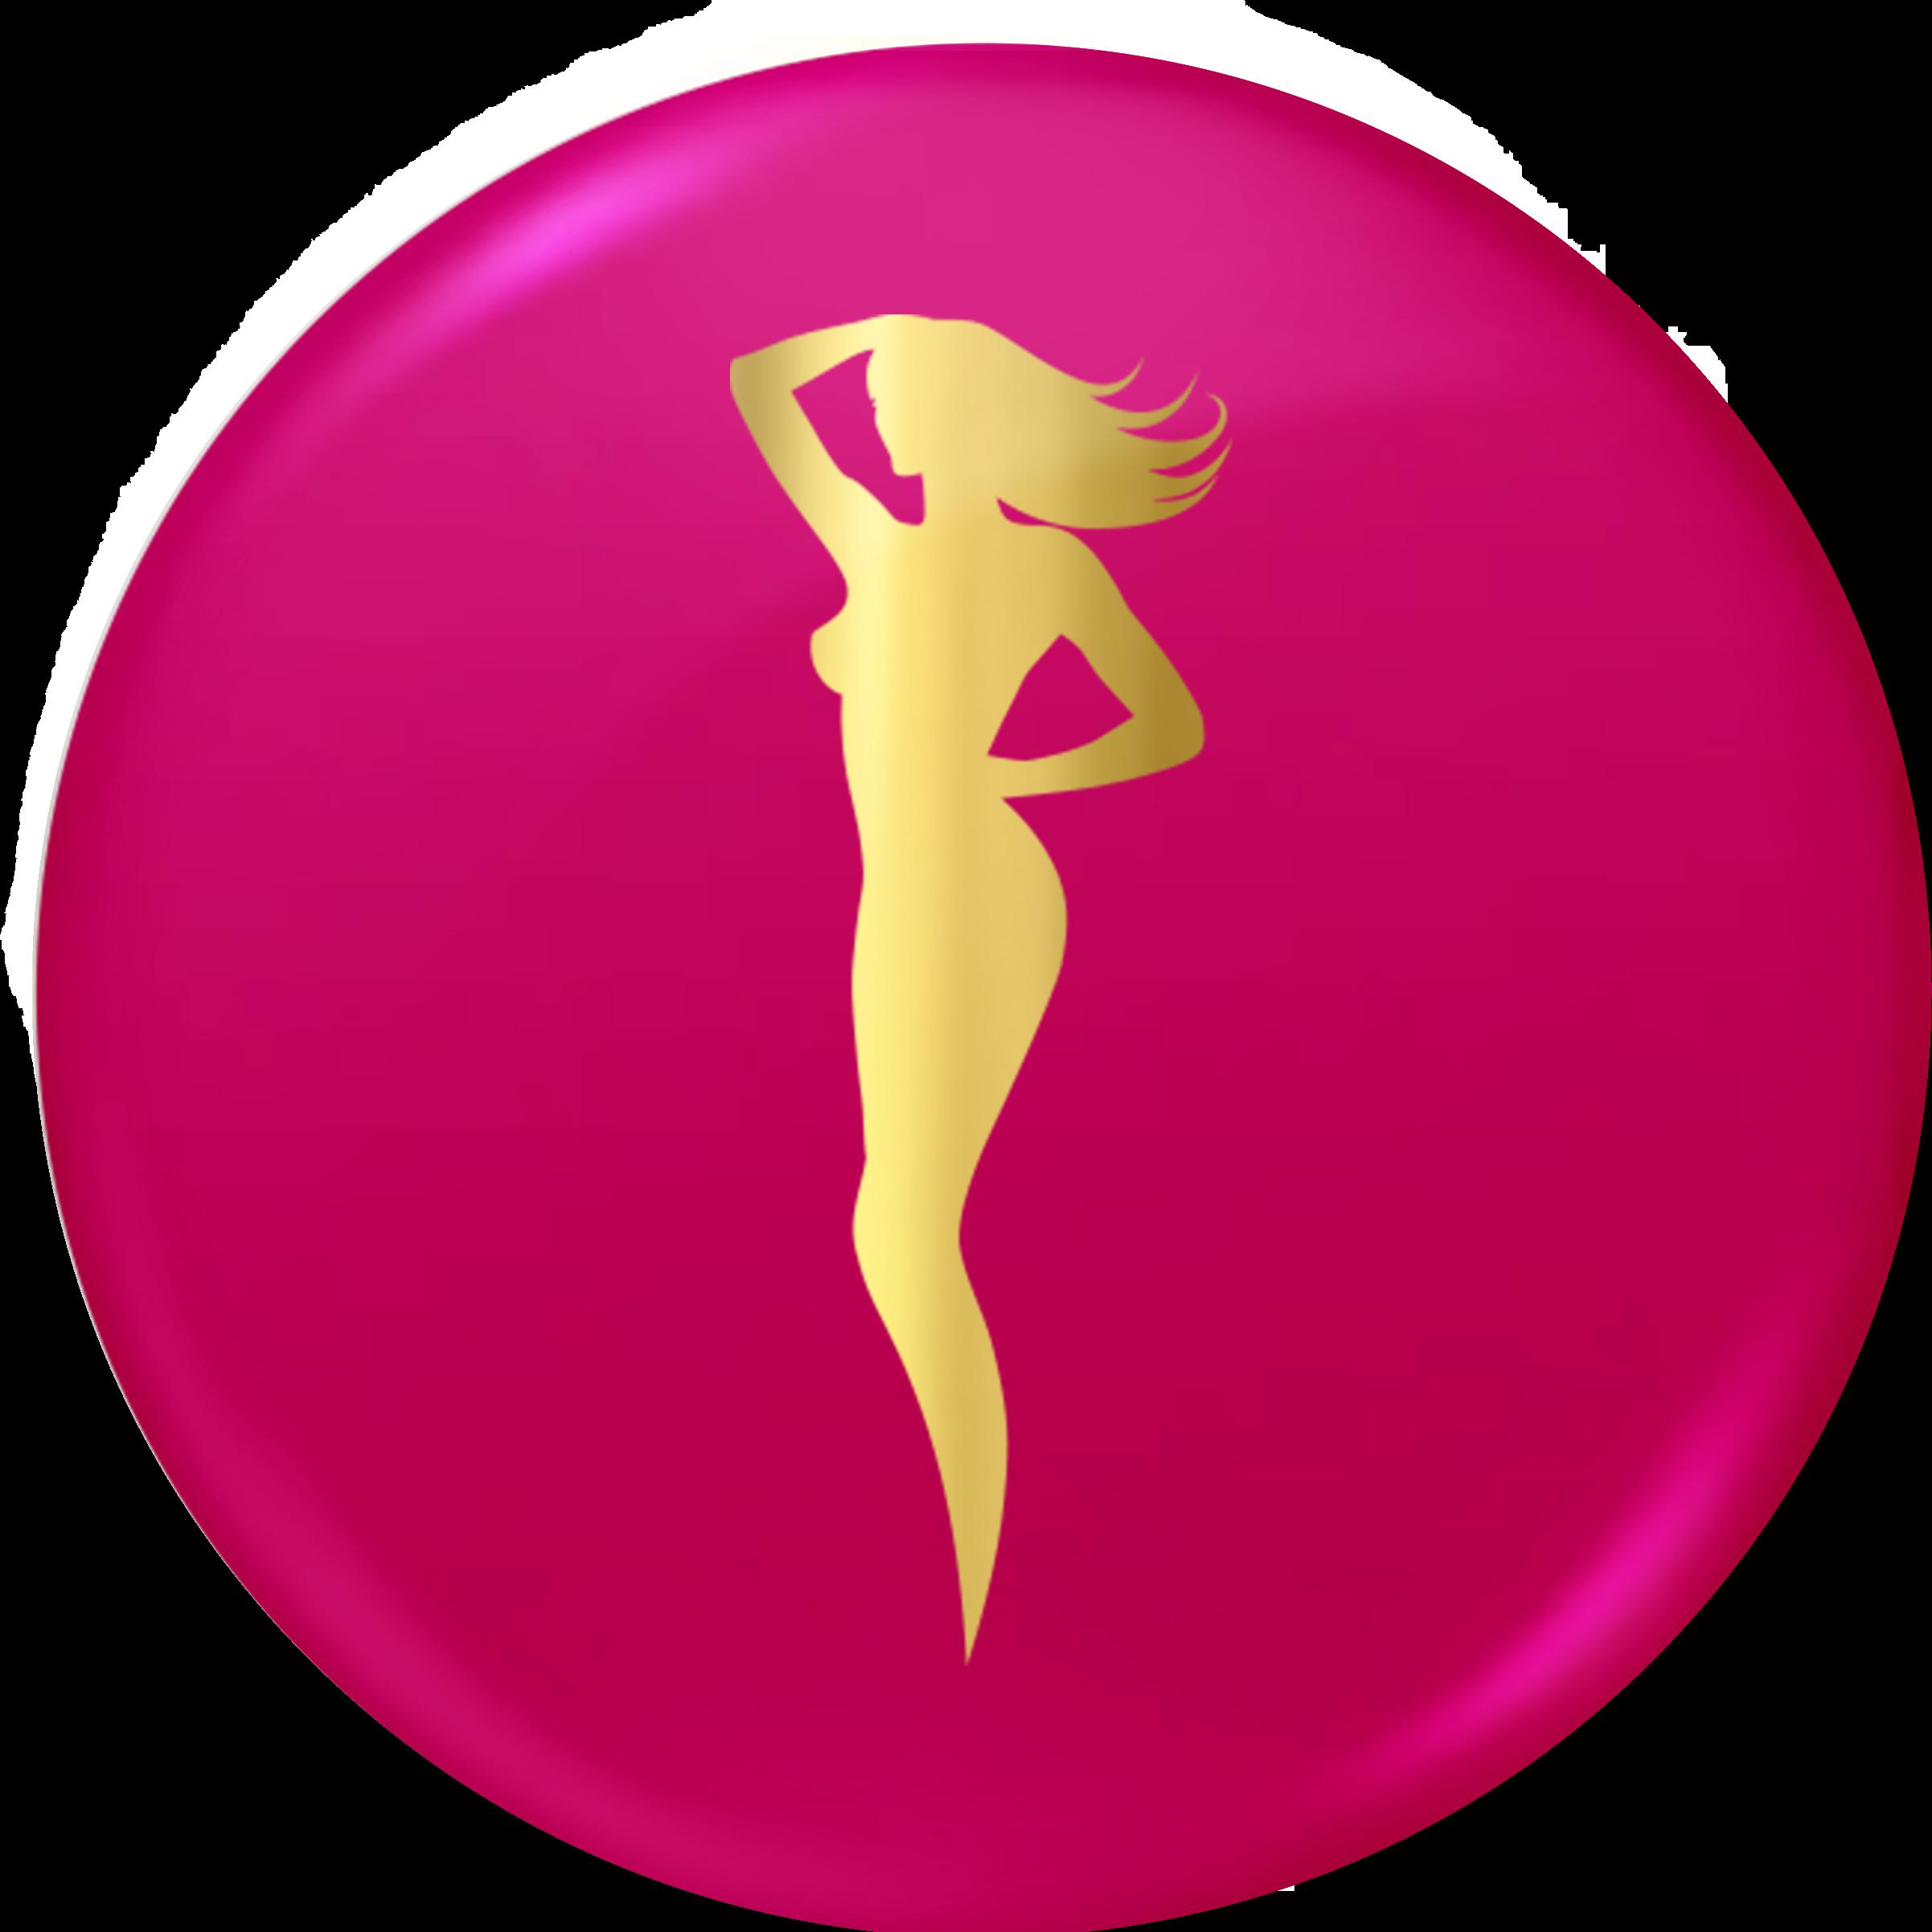 @mulhercheirosa Profile Image | Linktree